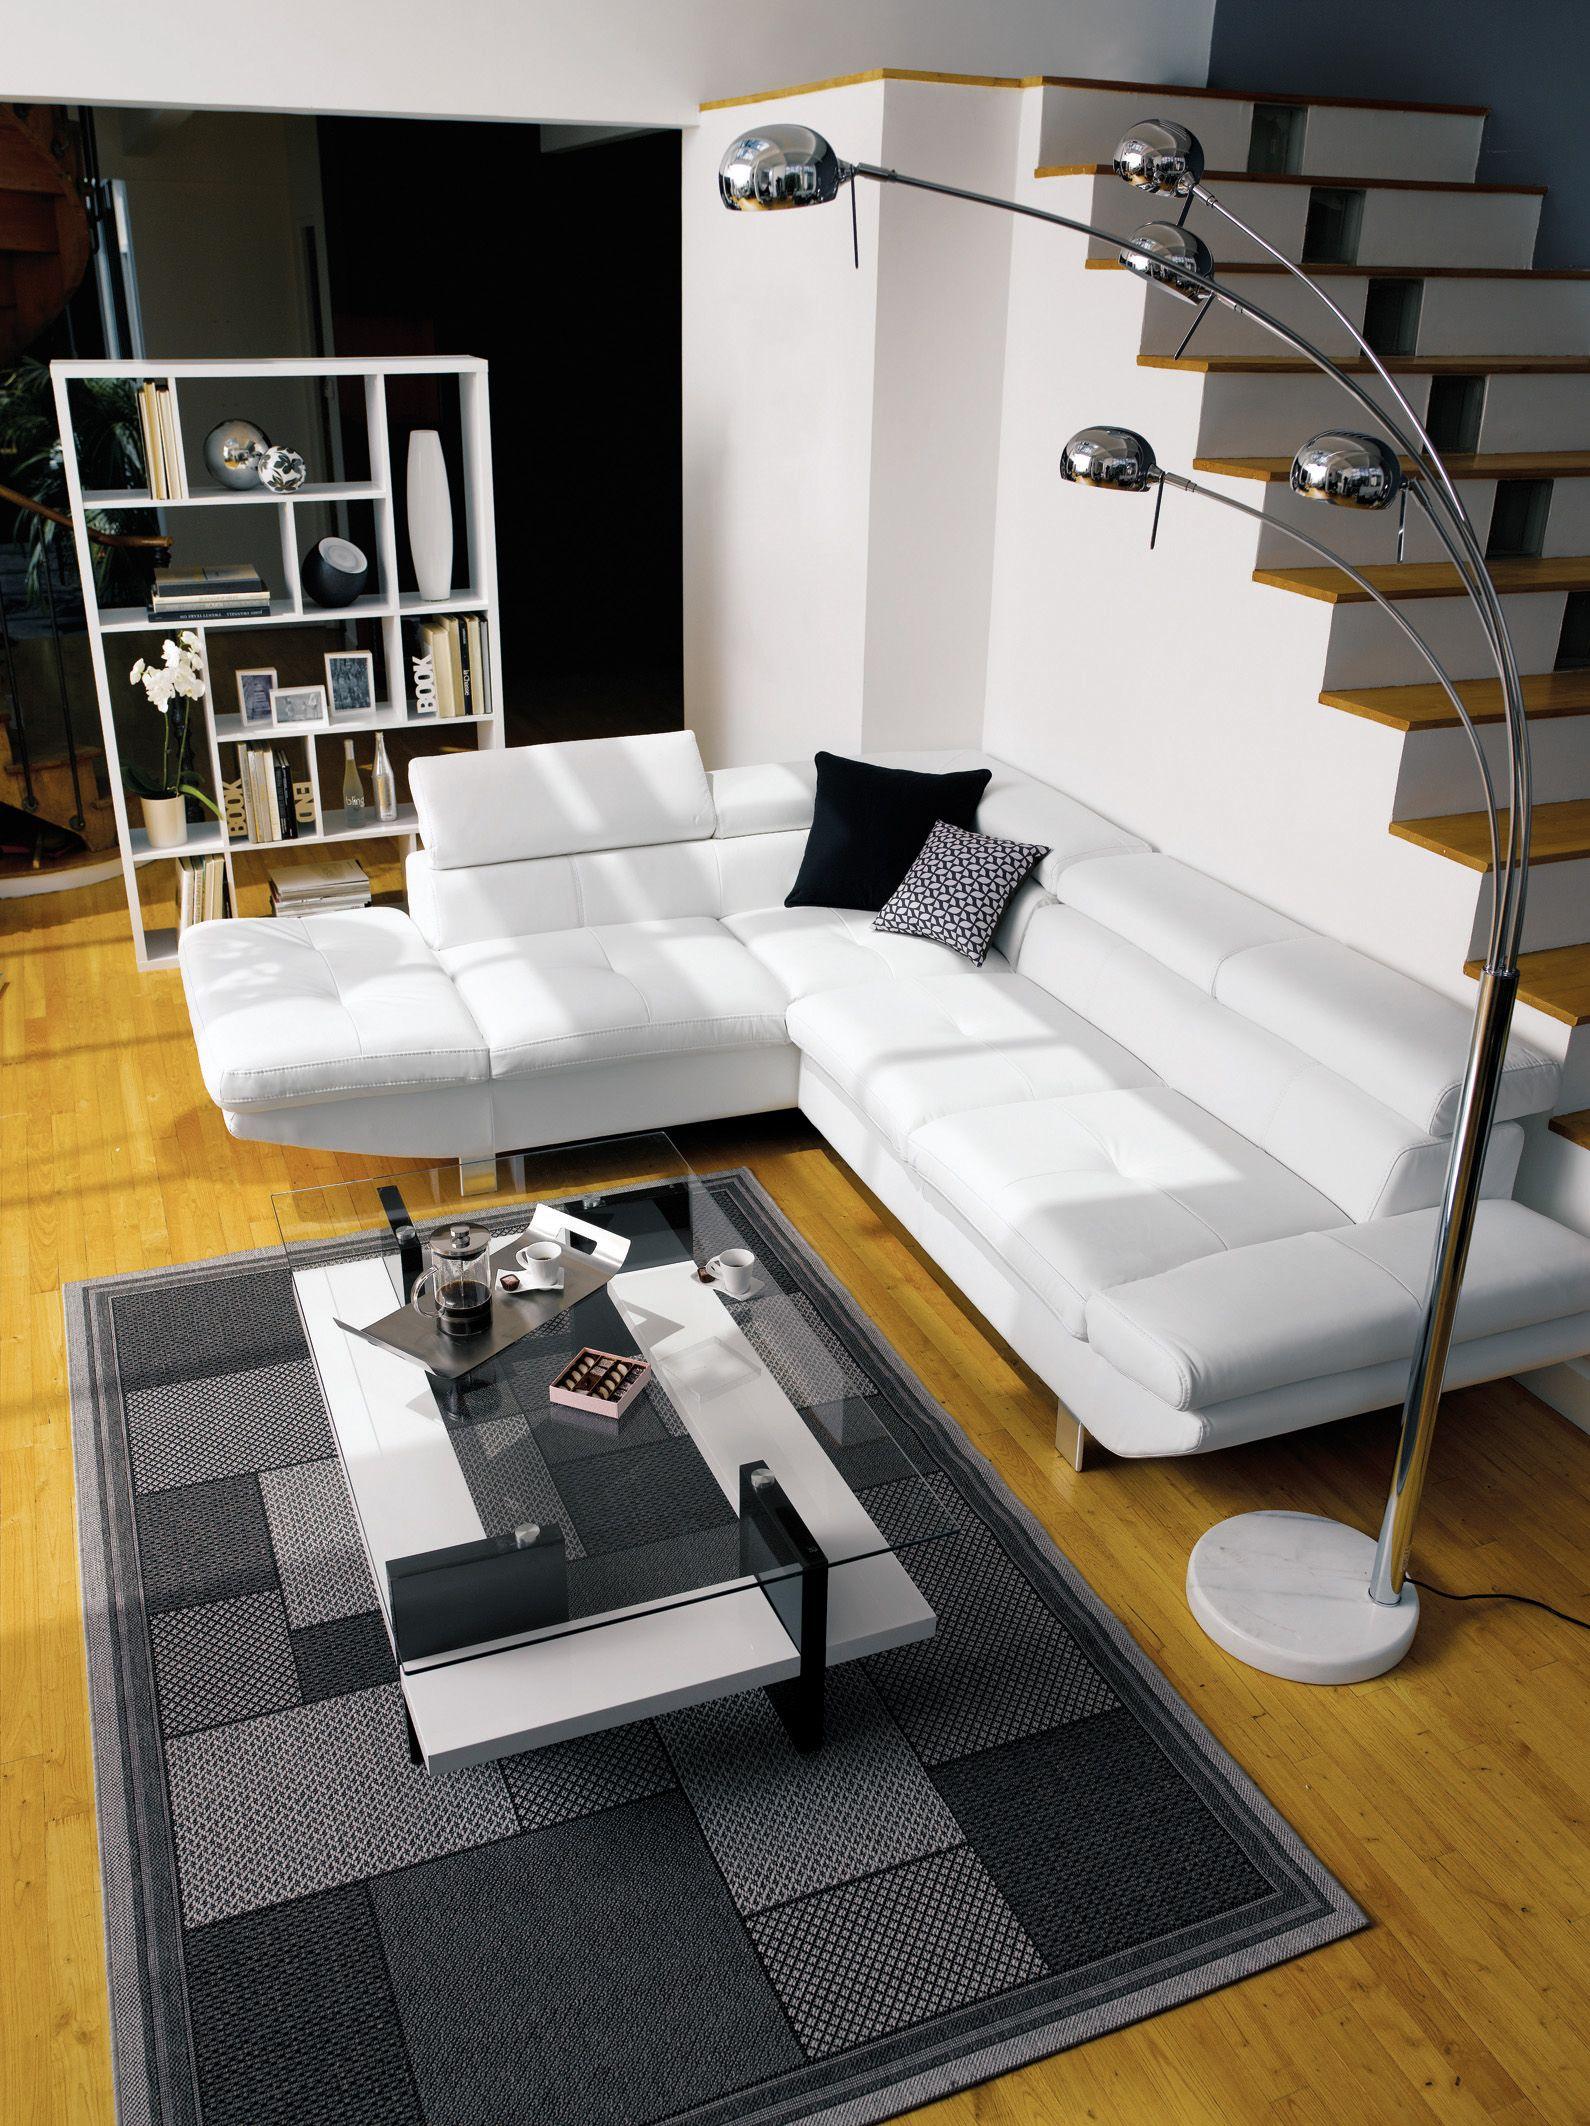 Conforama ambiance loft color home deco canap sofa ideas decoraci n - Canape loft conforama ...